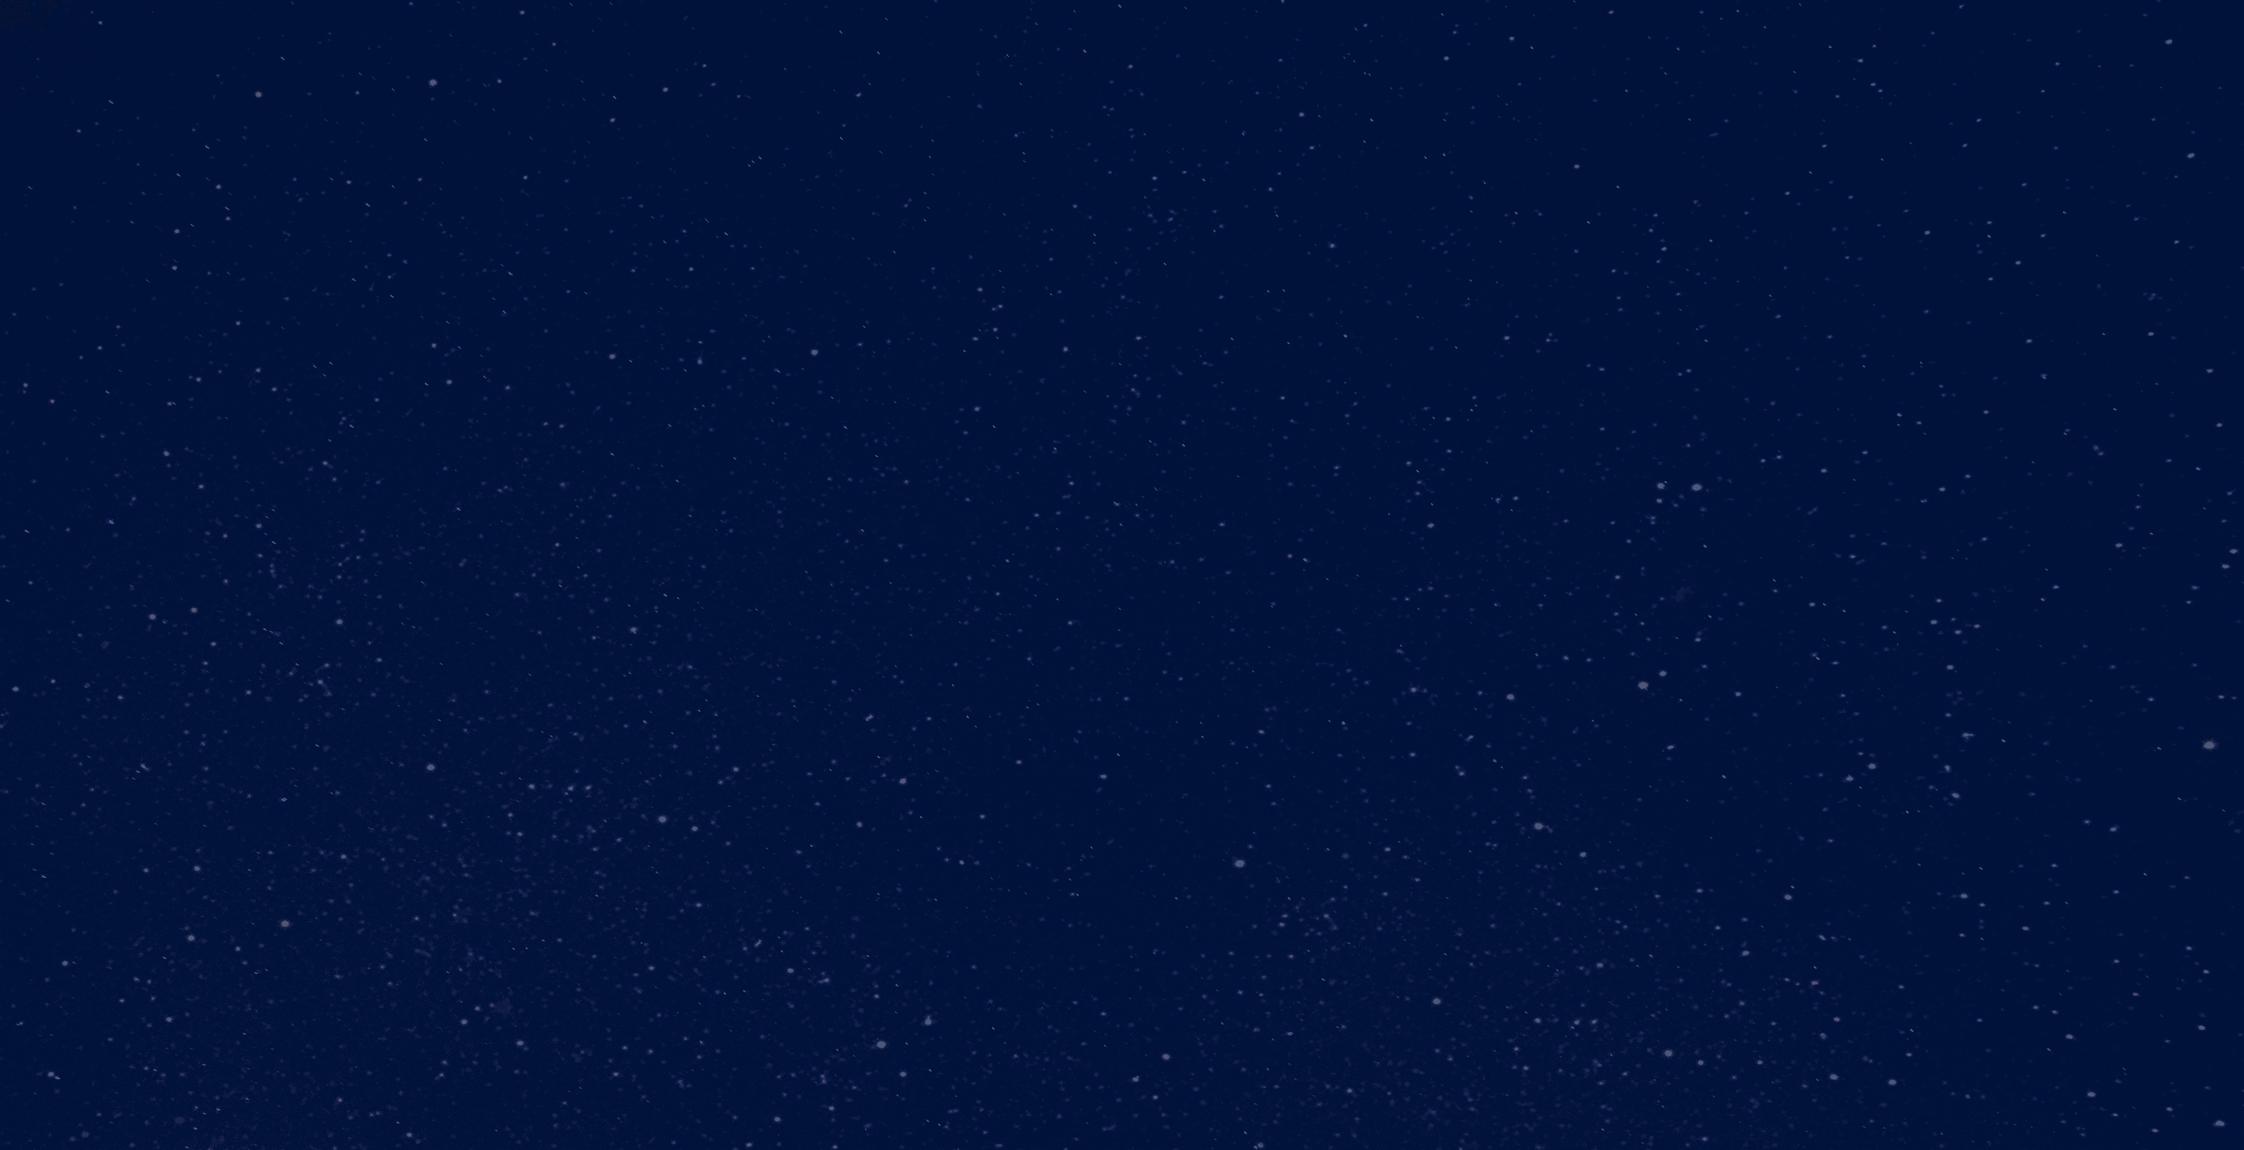 cielo stellato rielab mr 2